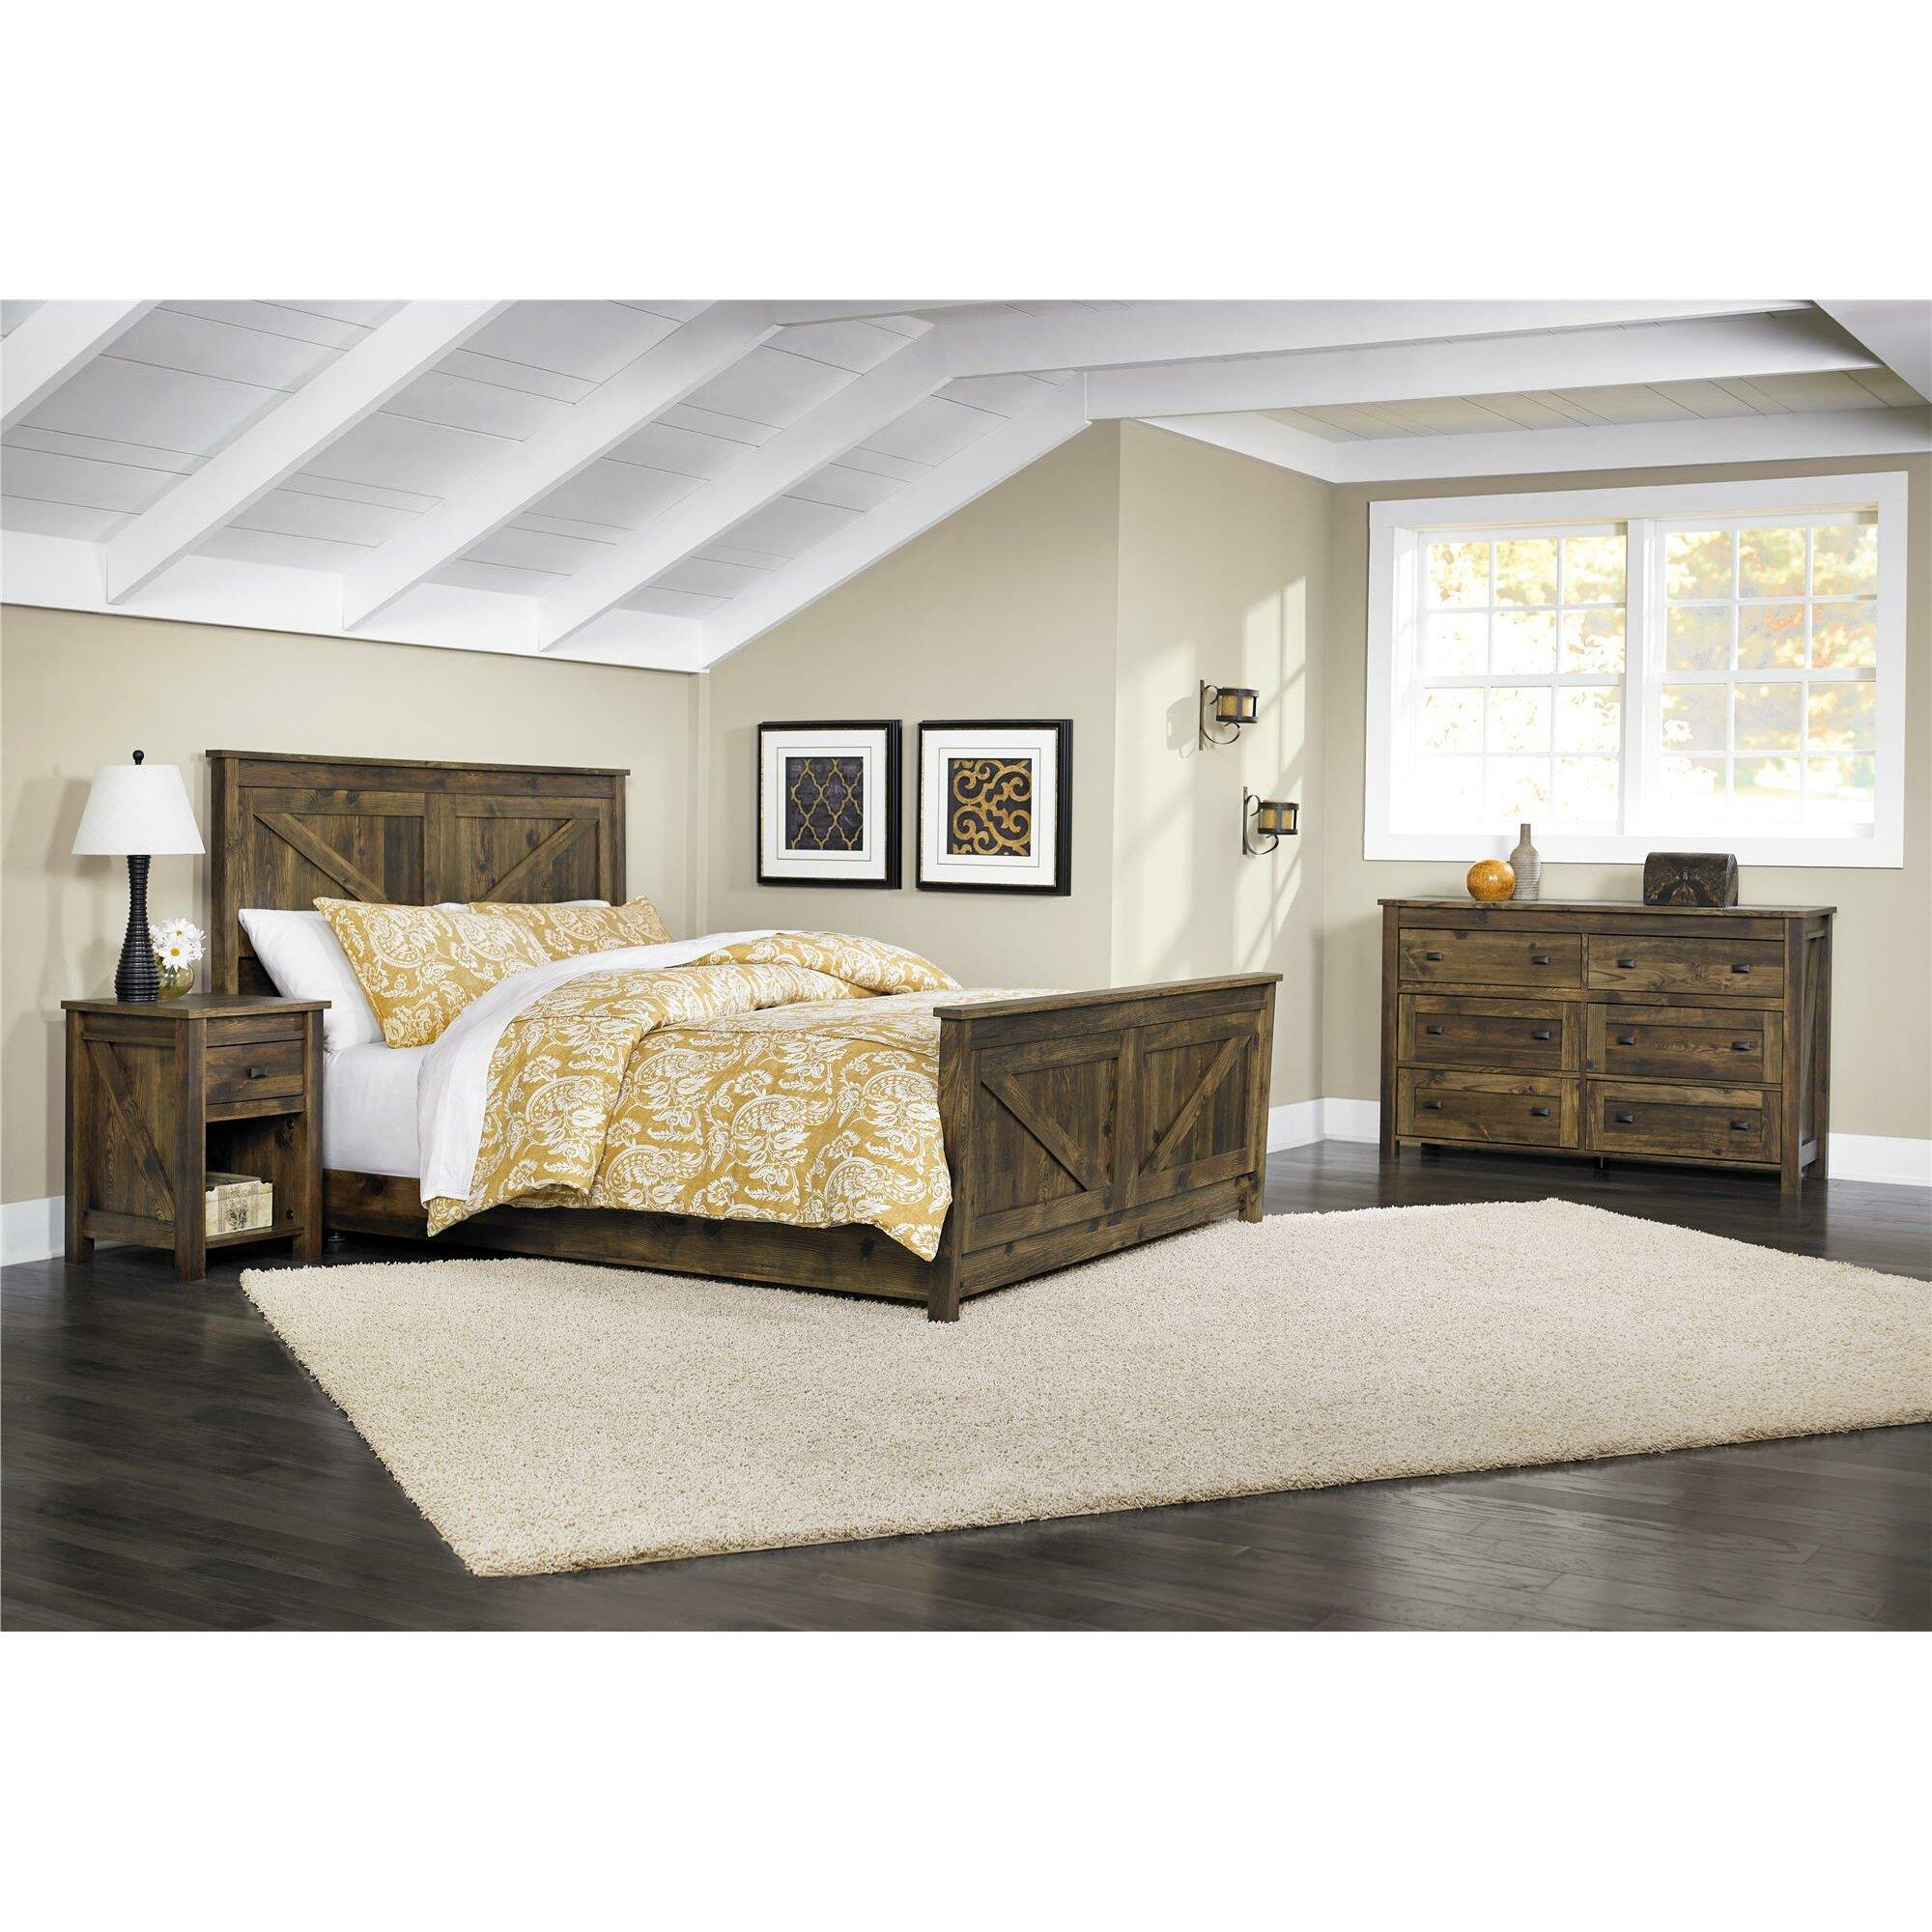 Old Fashioned Bedroom Furniture Old Fashioned Bedroom Furniture Wayfair